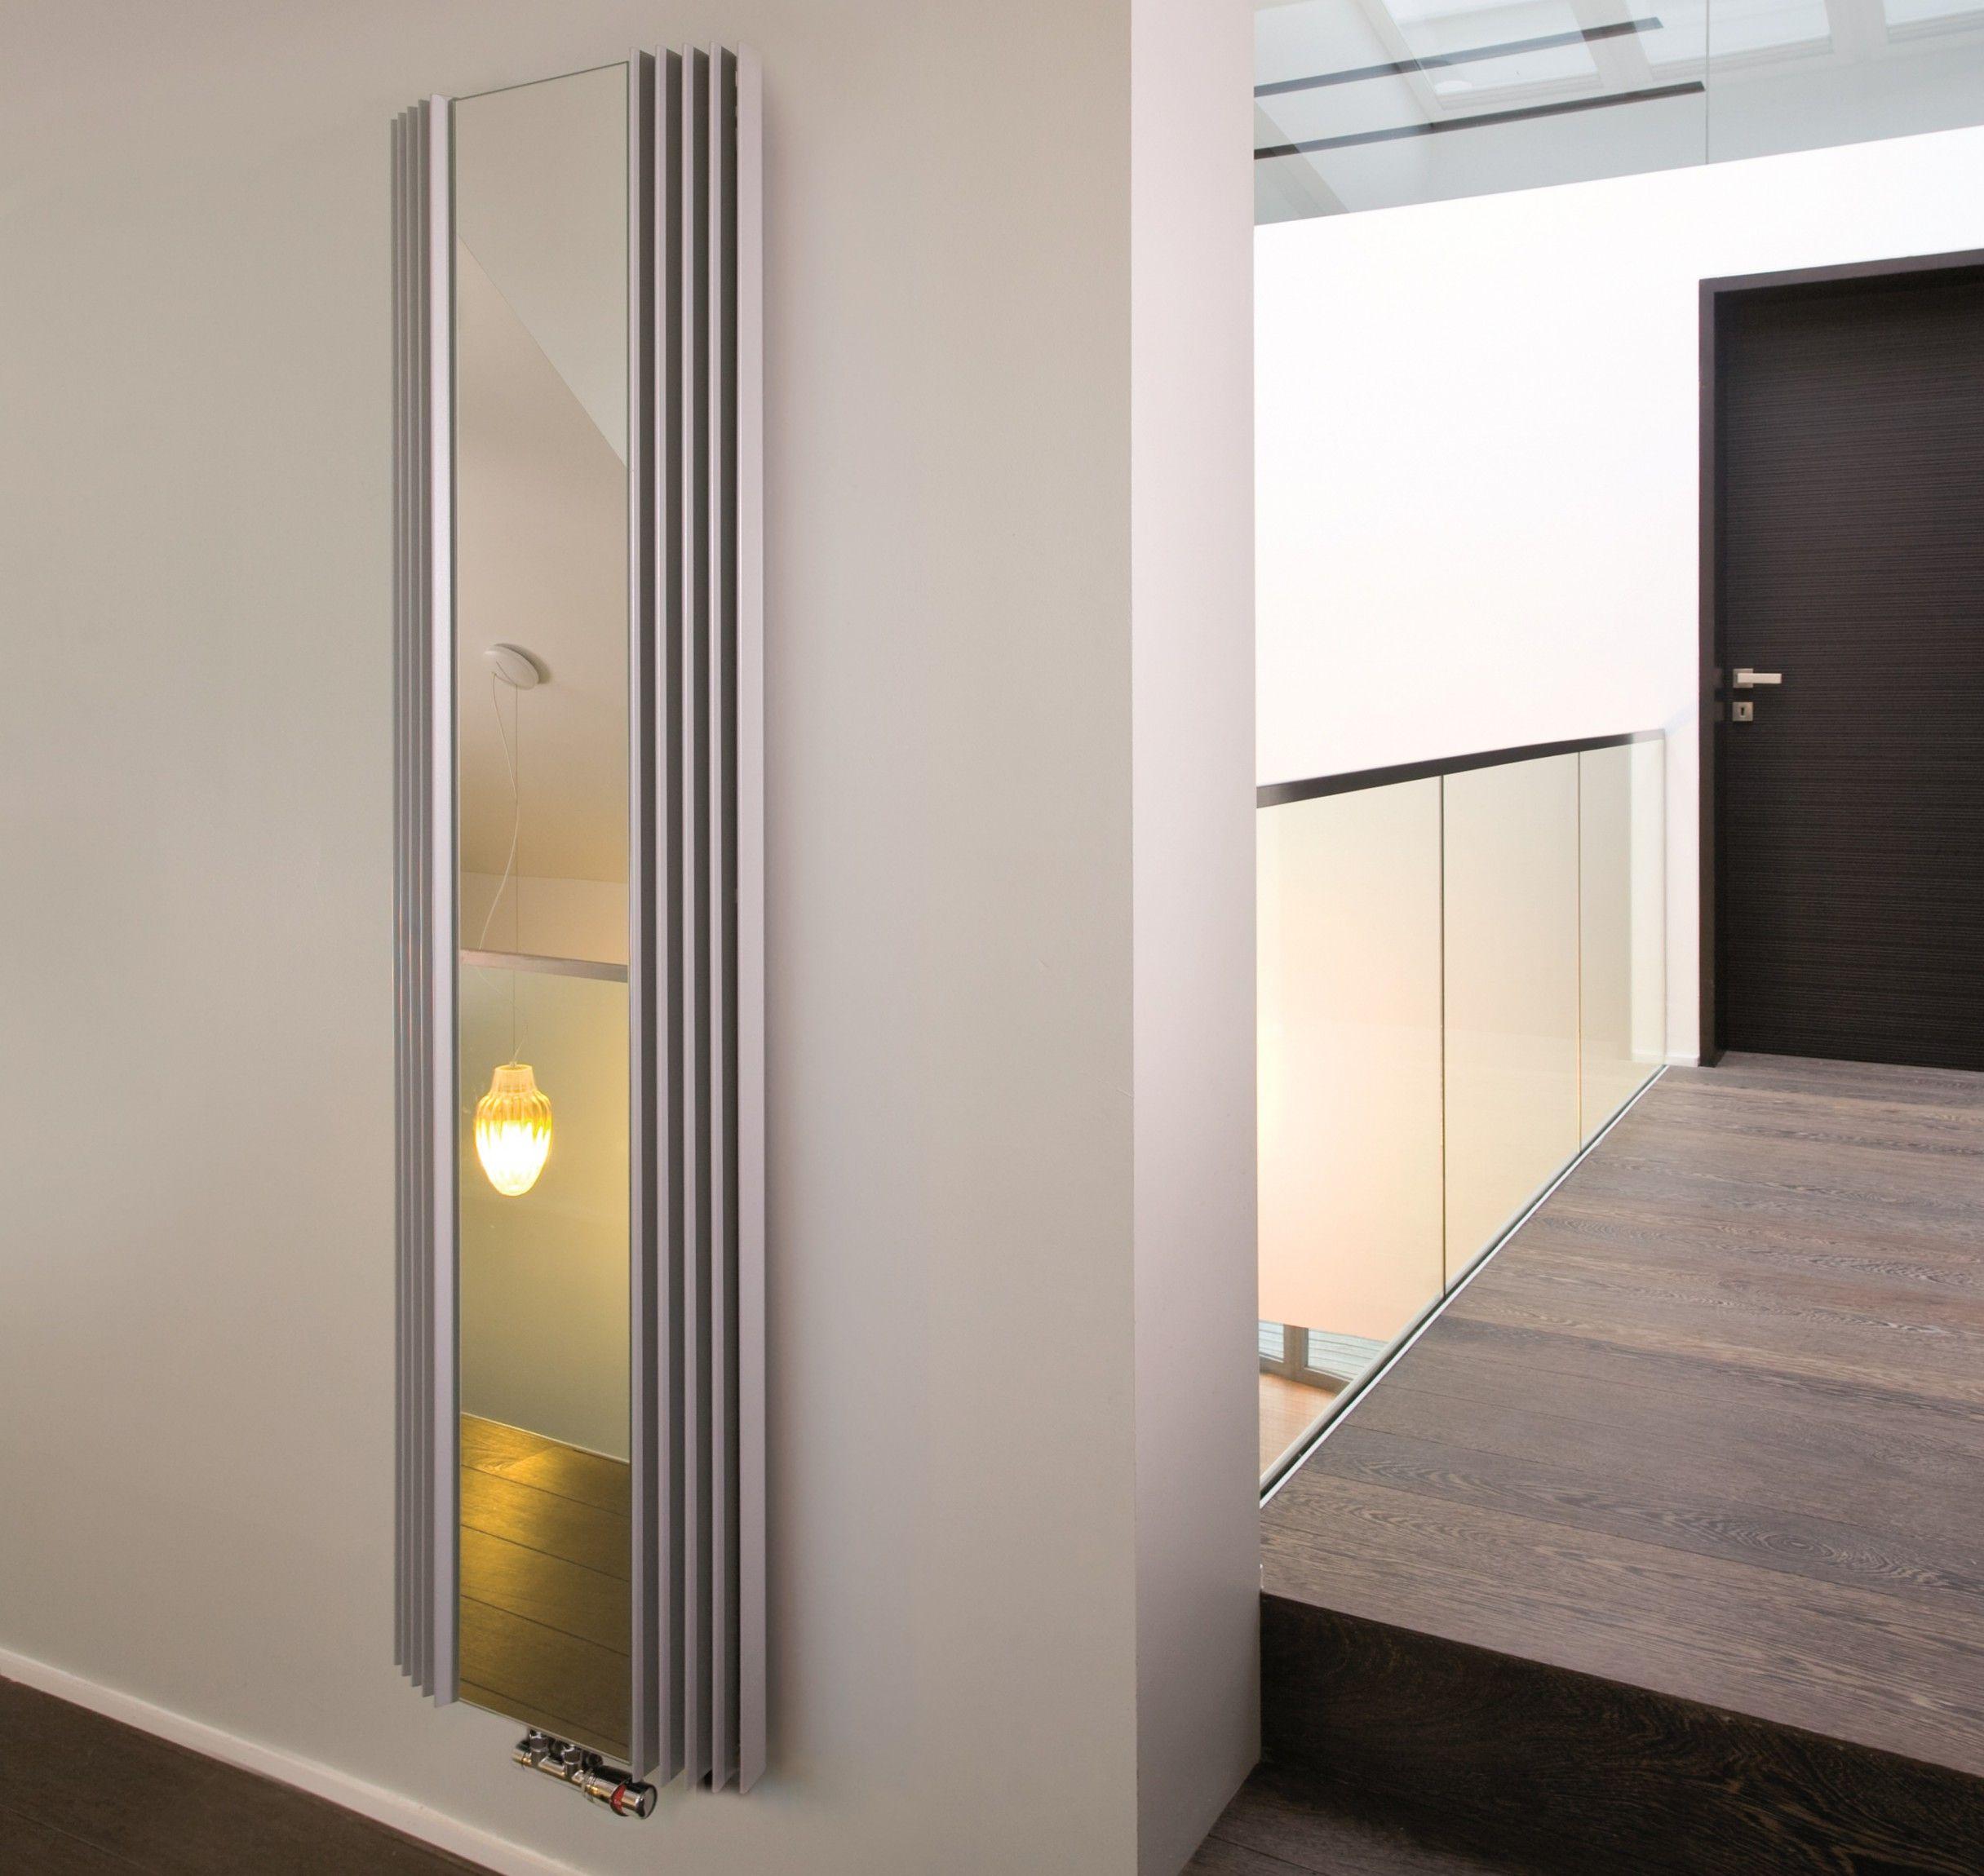 Design Heizkörper Spiegel 10 x ab 10 cm ab 10 Watt Heizkörper